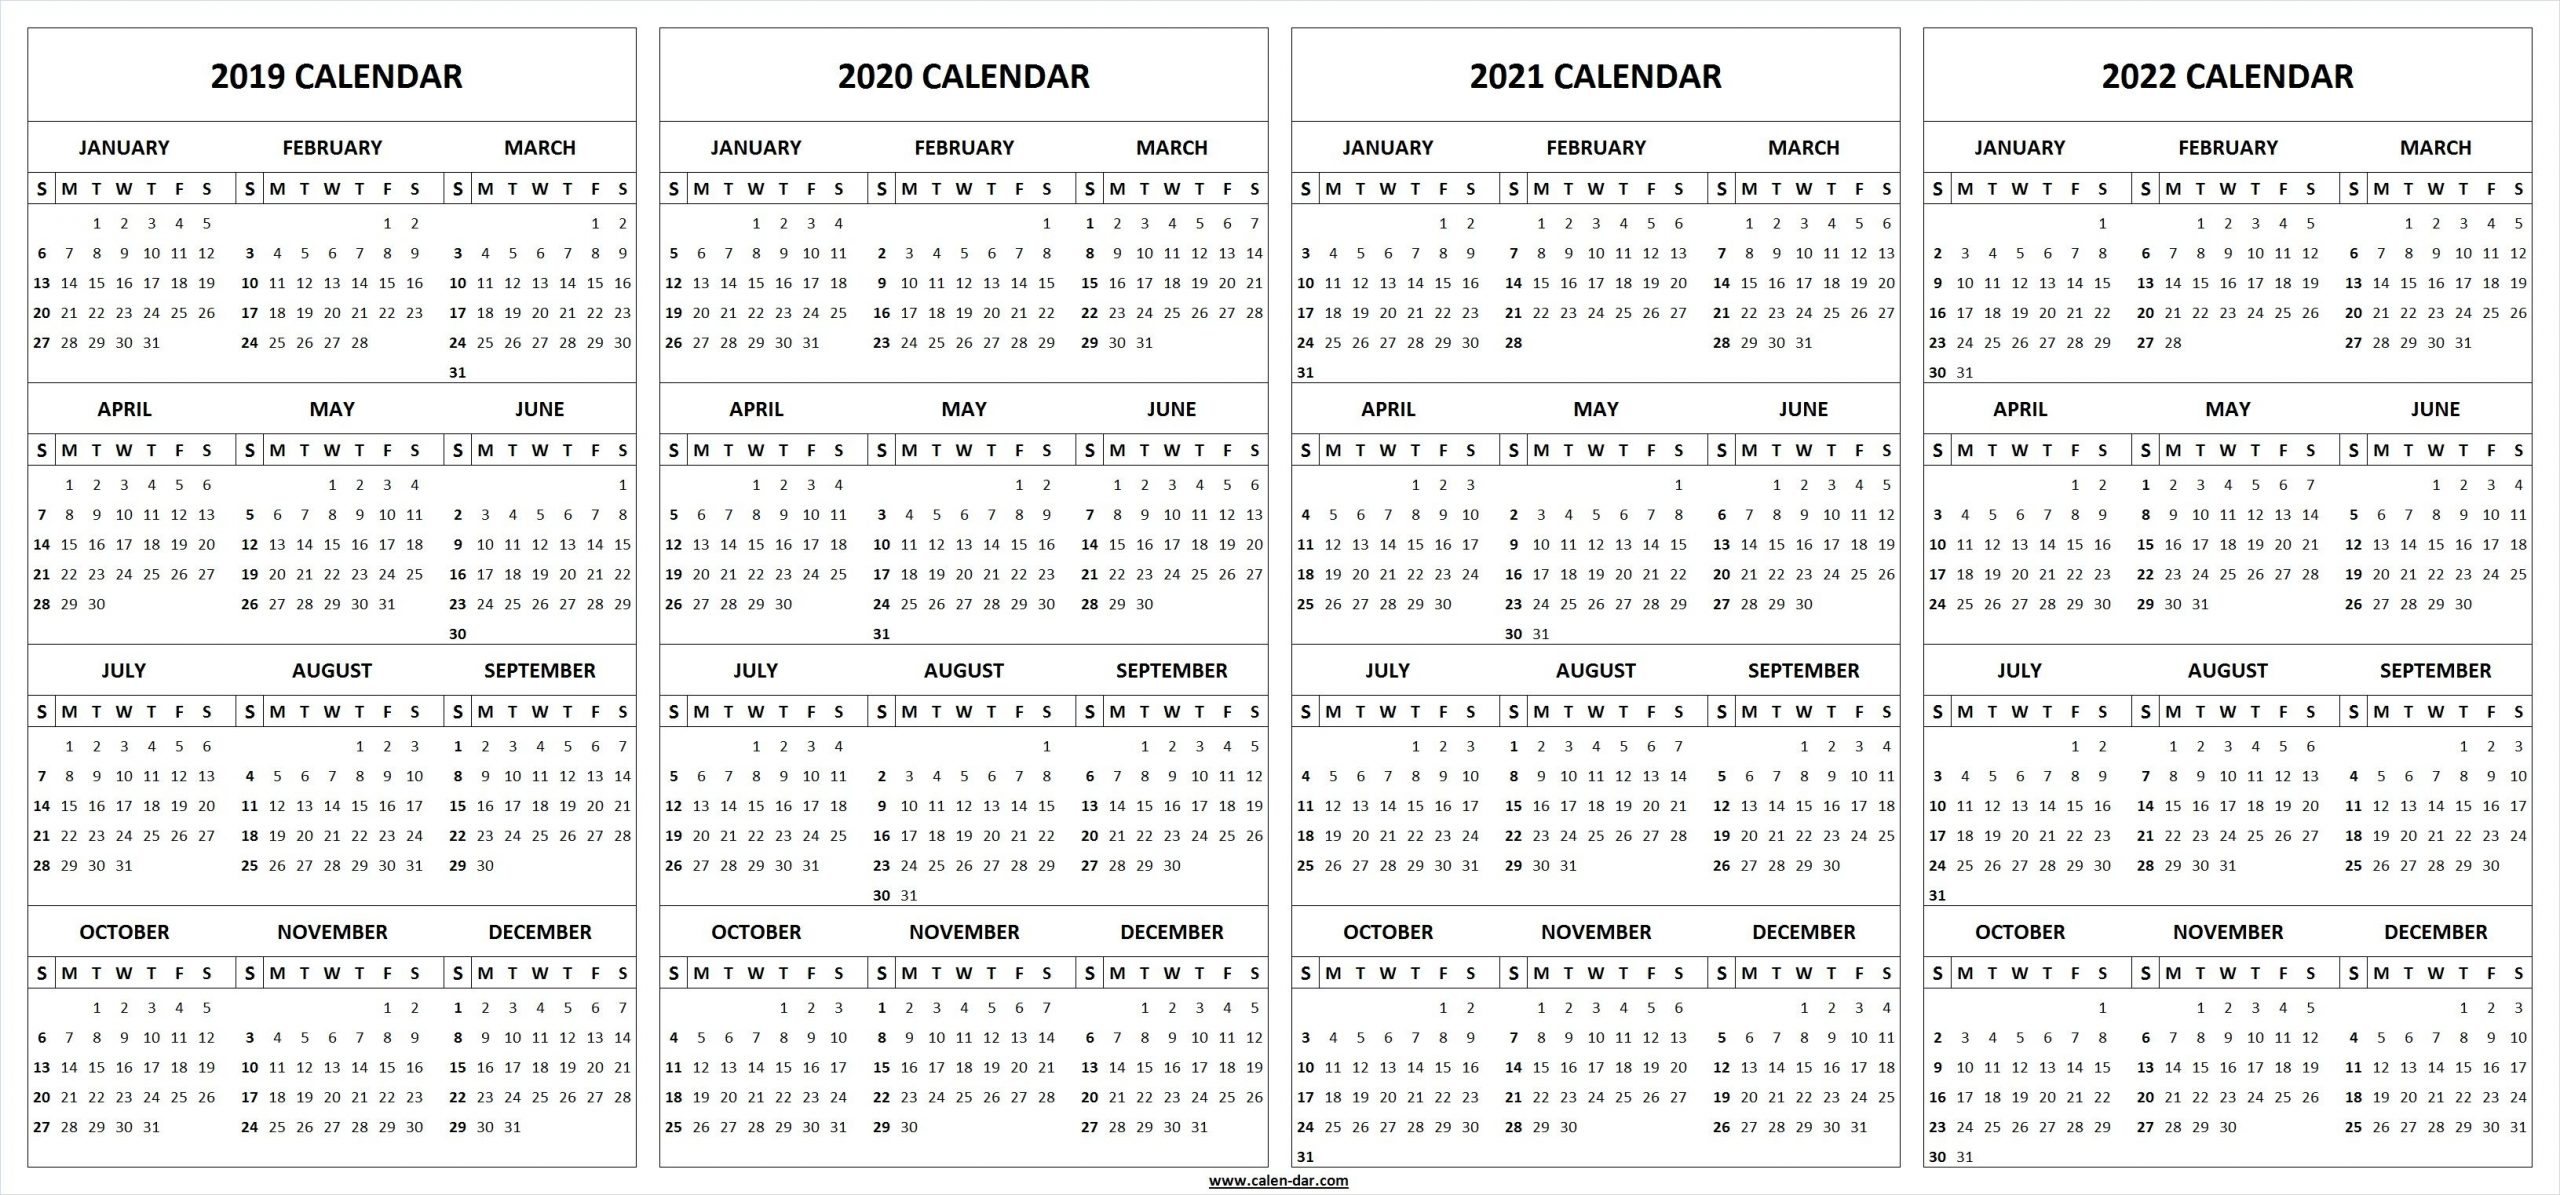 2019 2020 2021 2022 Calendar Blank Template | Calendar pertaining to Printable Calendar 2020 2021 2022